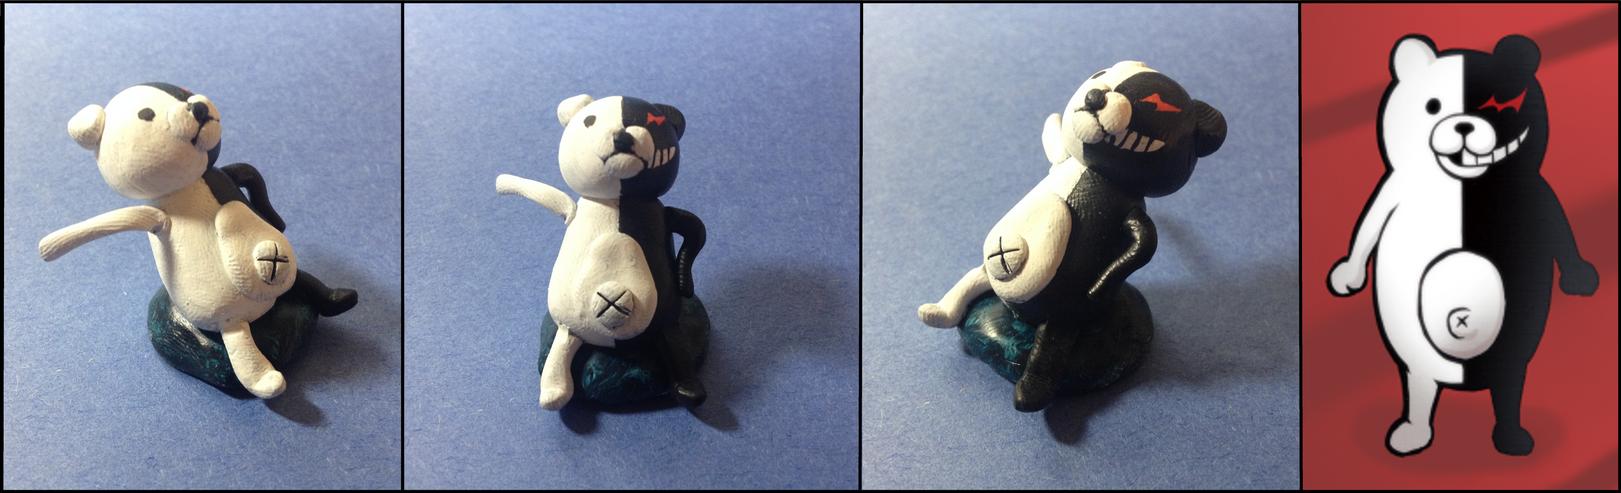 Lion Sculpts: Monokuma upupupu by Lion-Oh-Day